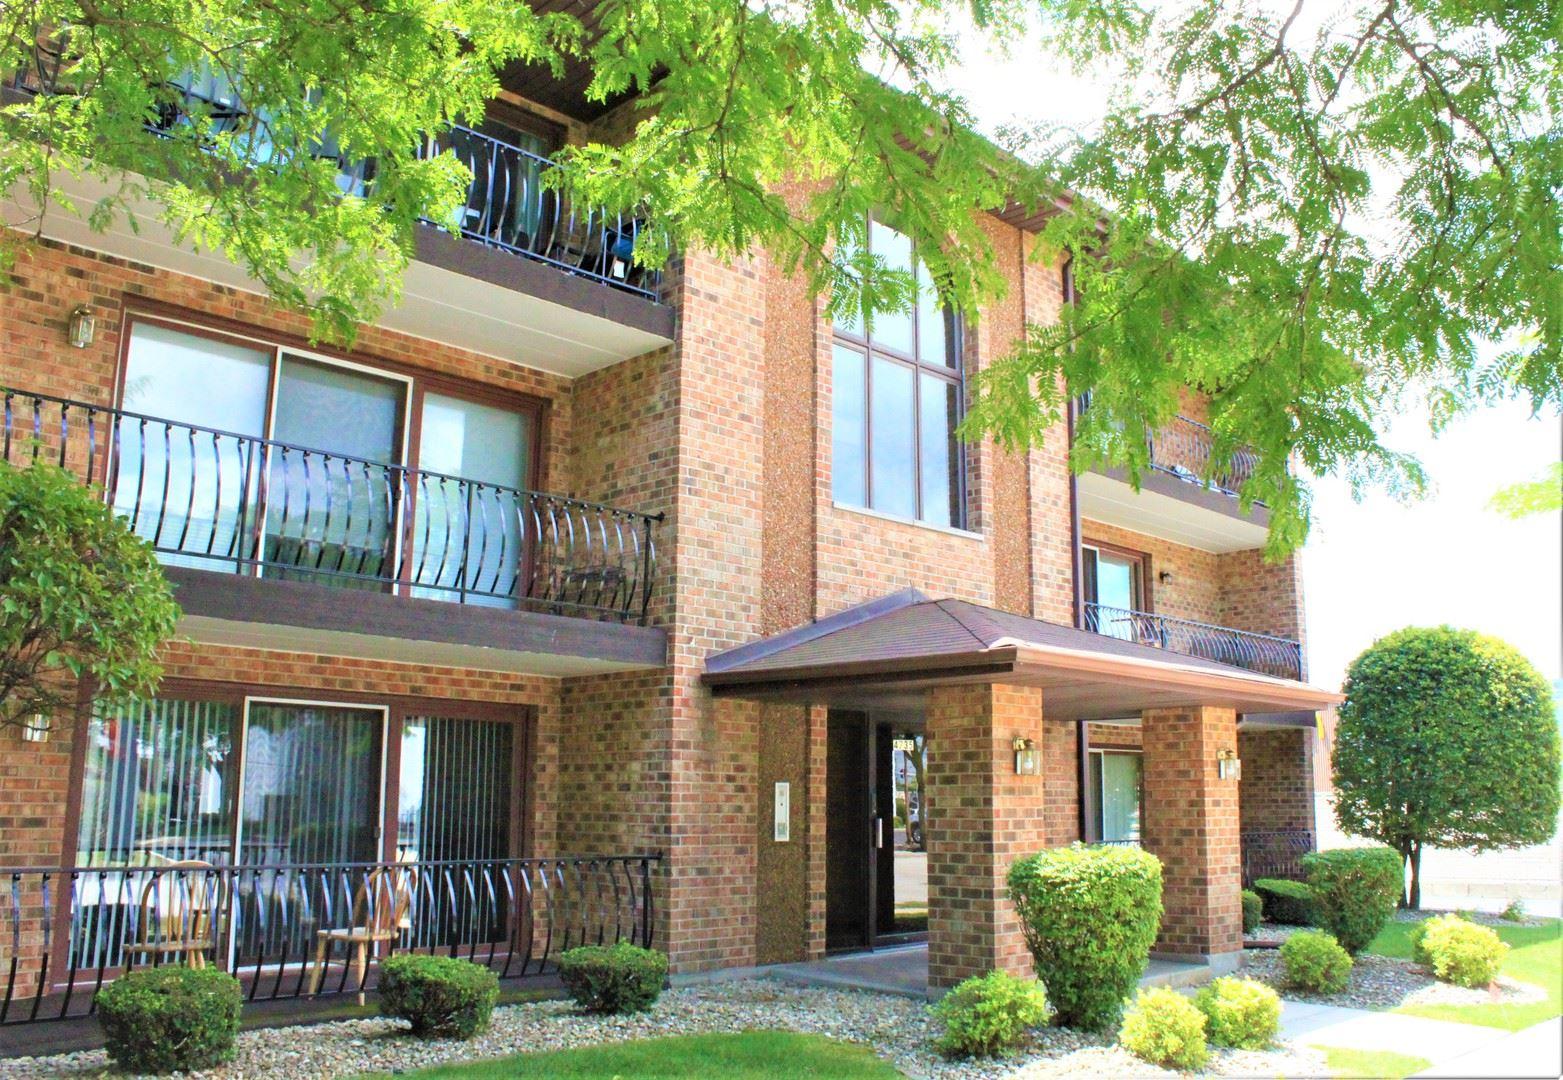 4735 W 105th Place #2B, Oak Lawn, IL 60453 - #: 10750199